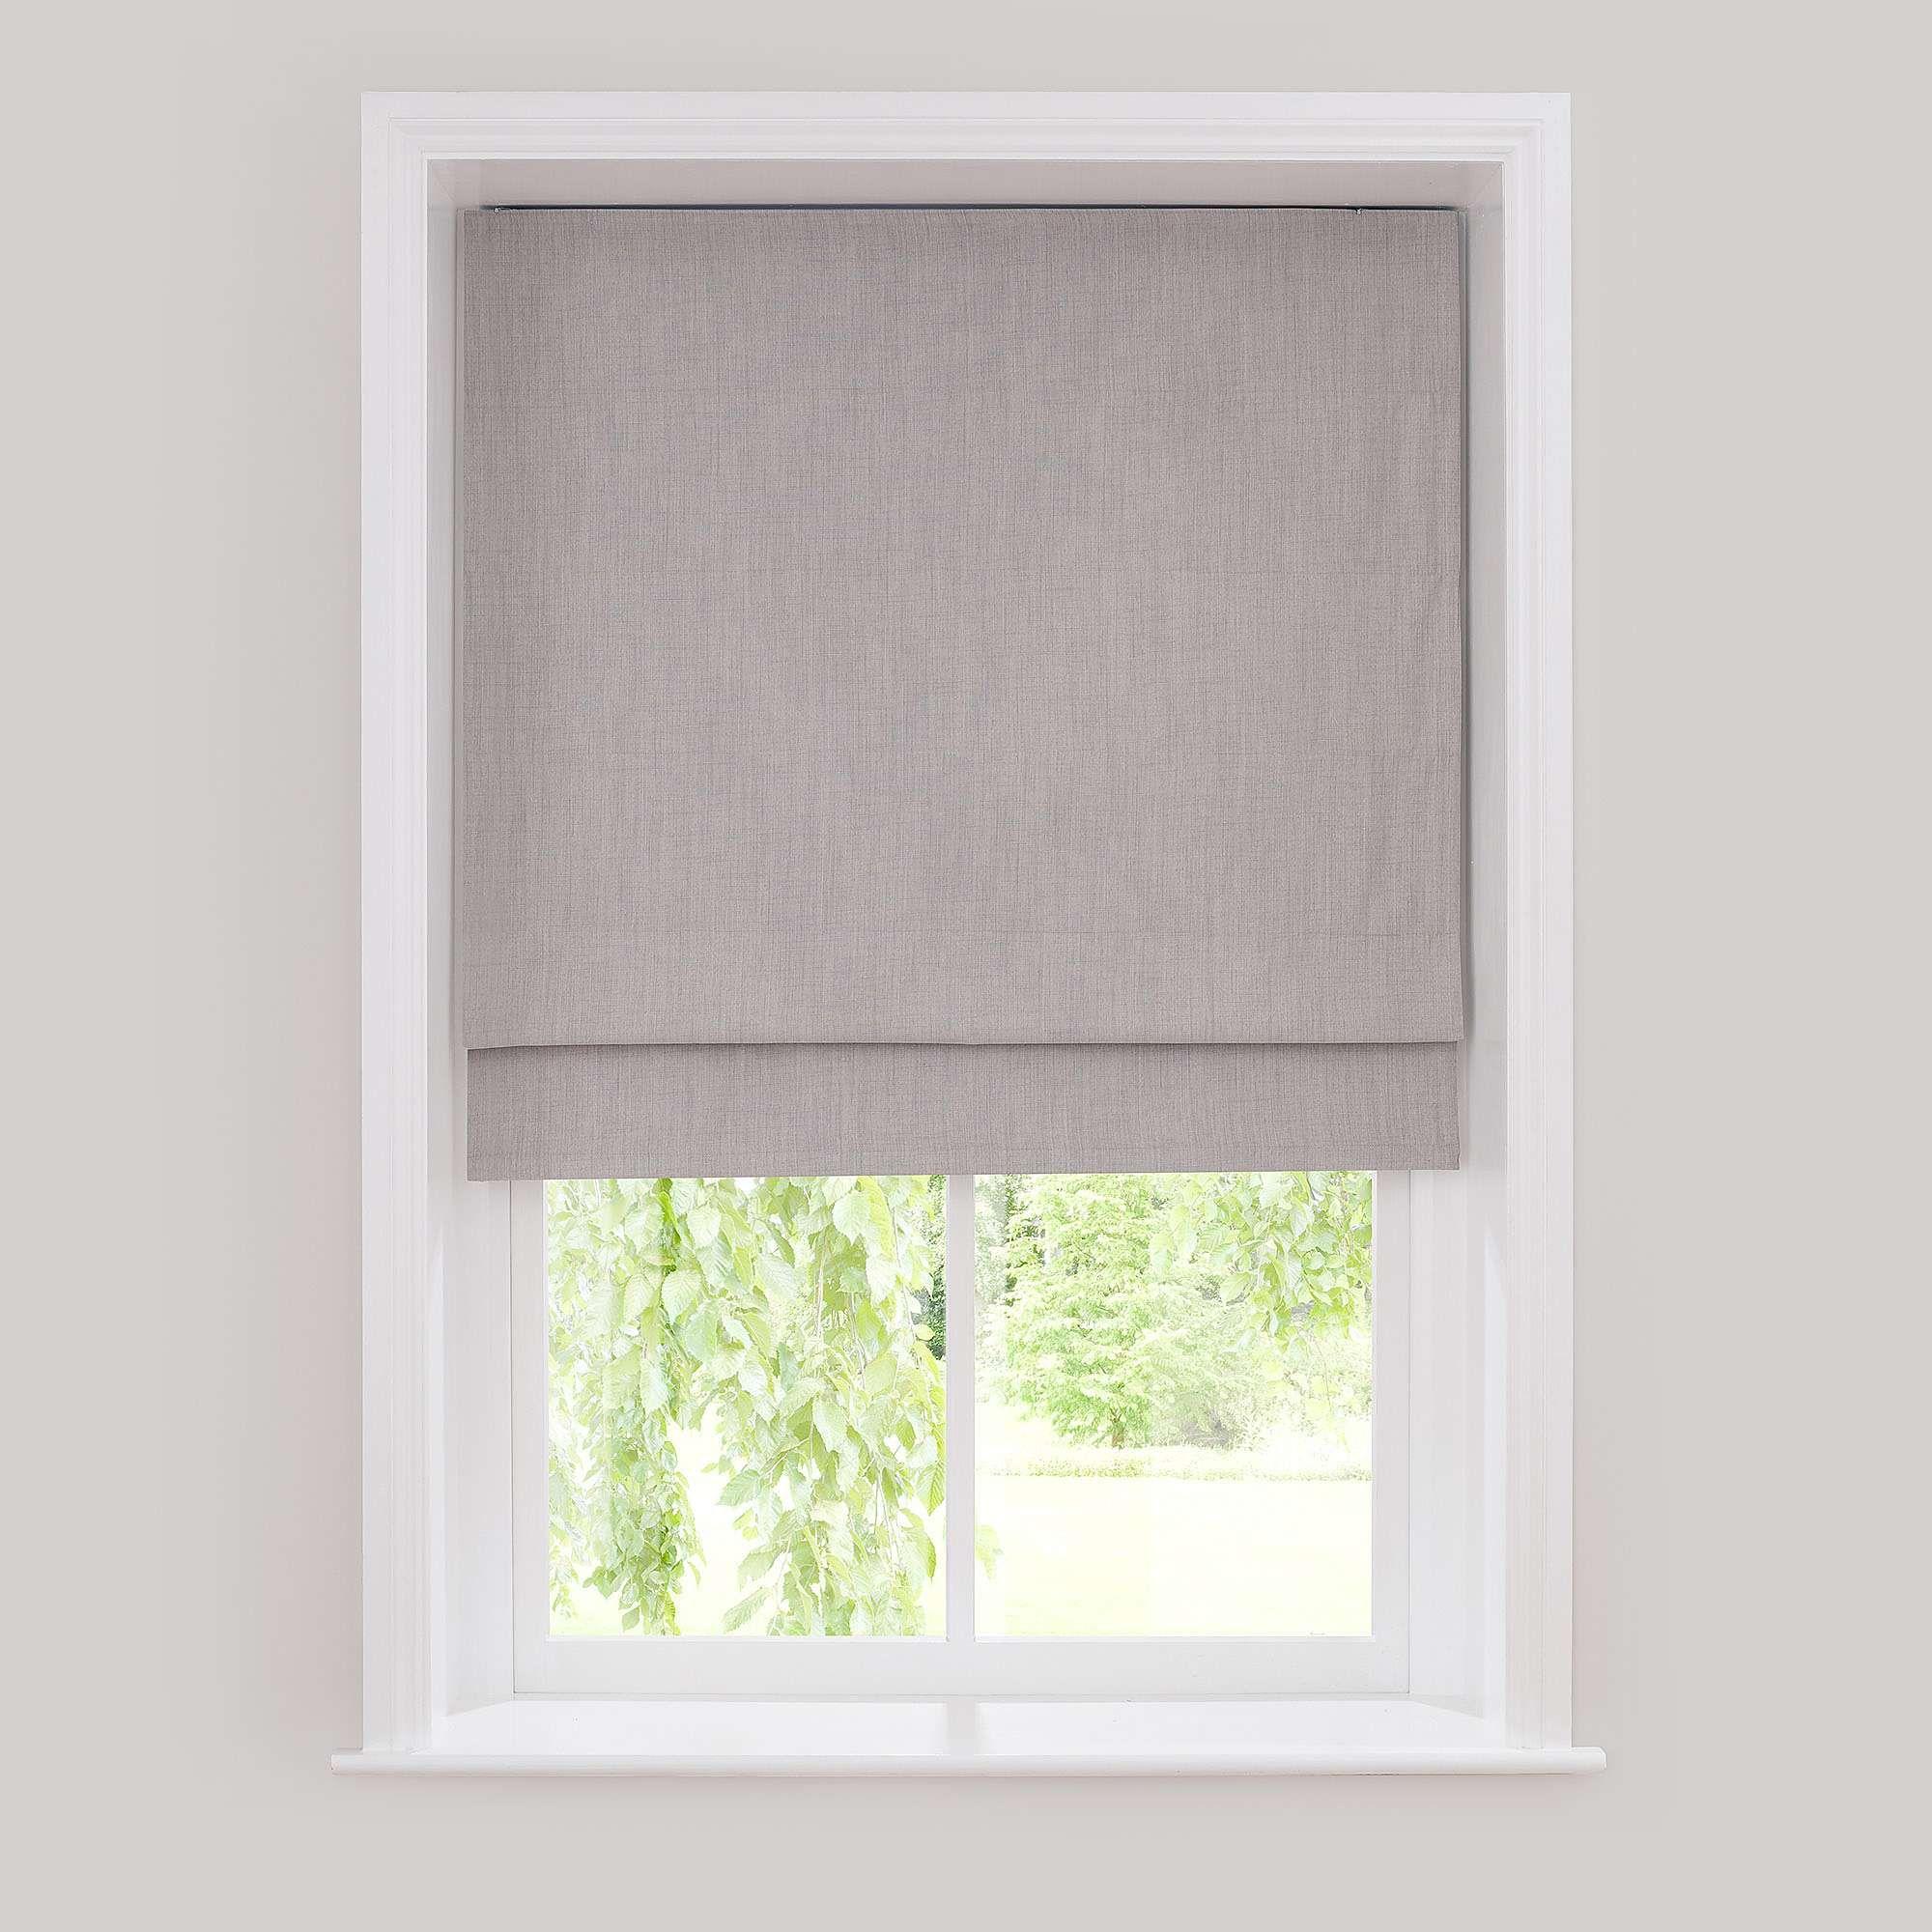 Solar Grey Blackout Roman Blind Dunelm House Blinds Blackout Roman Blinds Curtains With Blinds